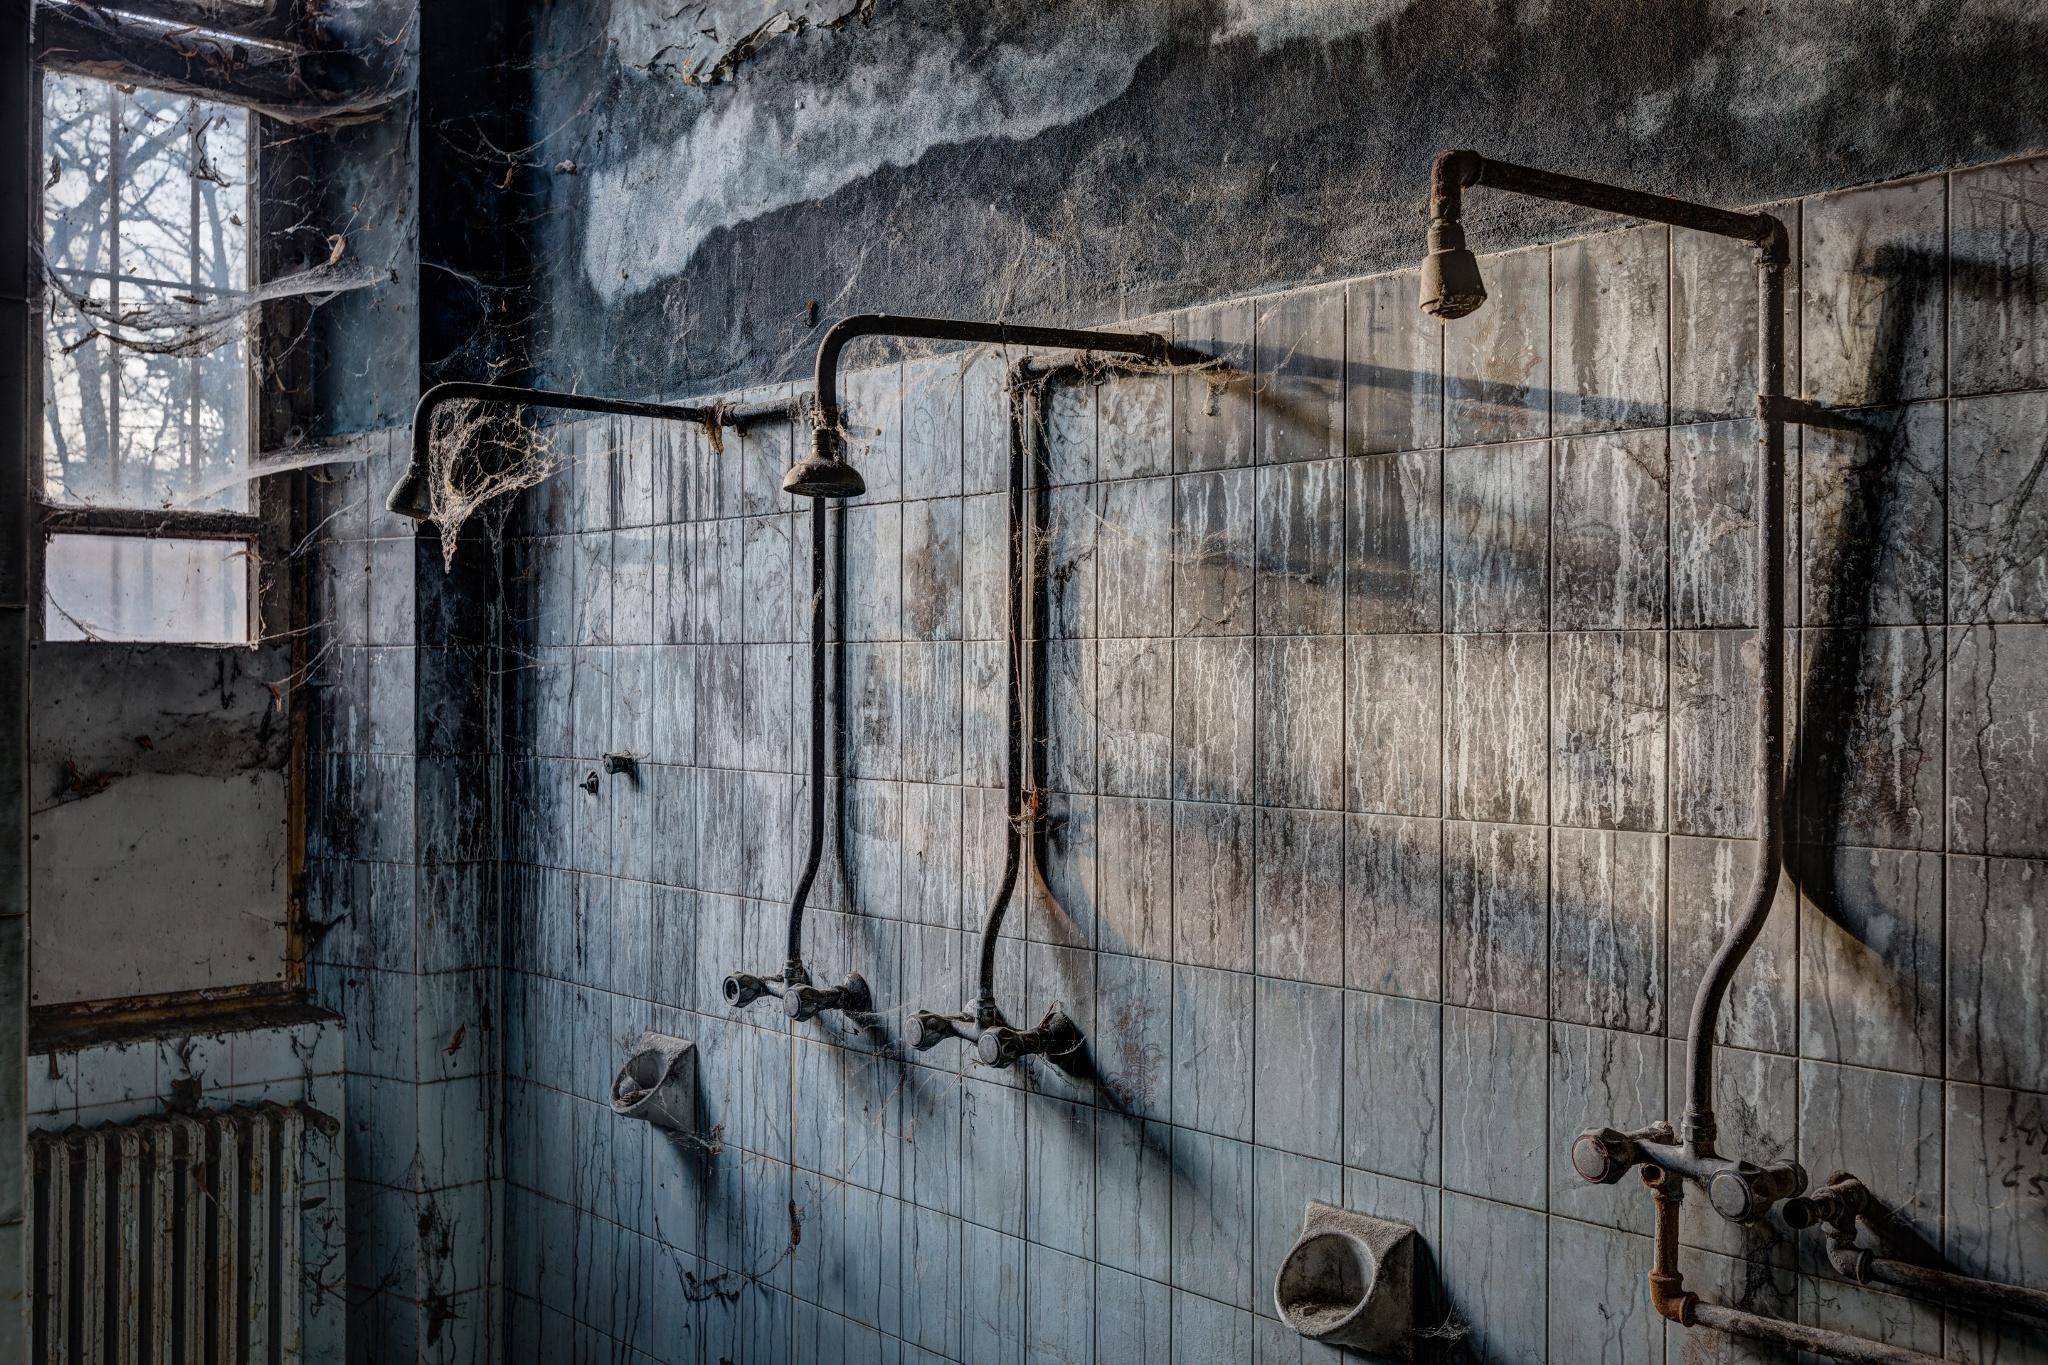 Abandoned psychiatric hospital 14